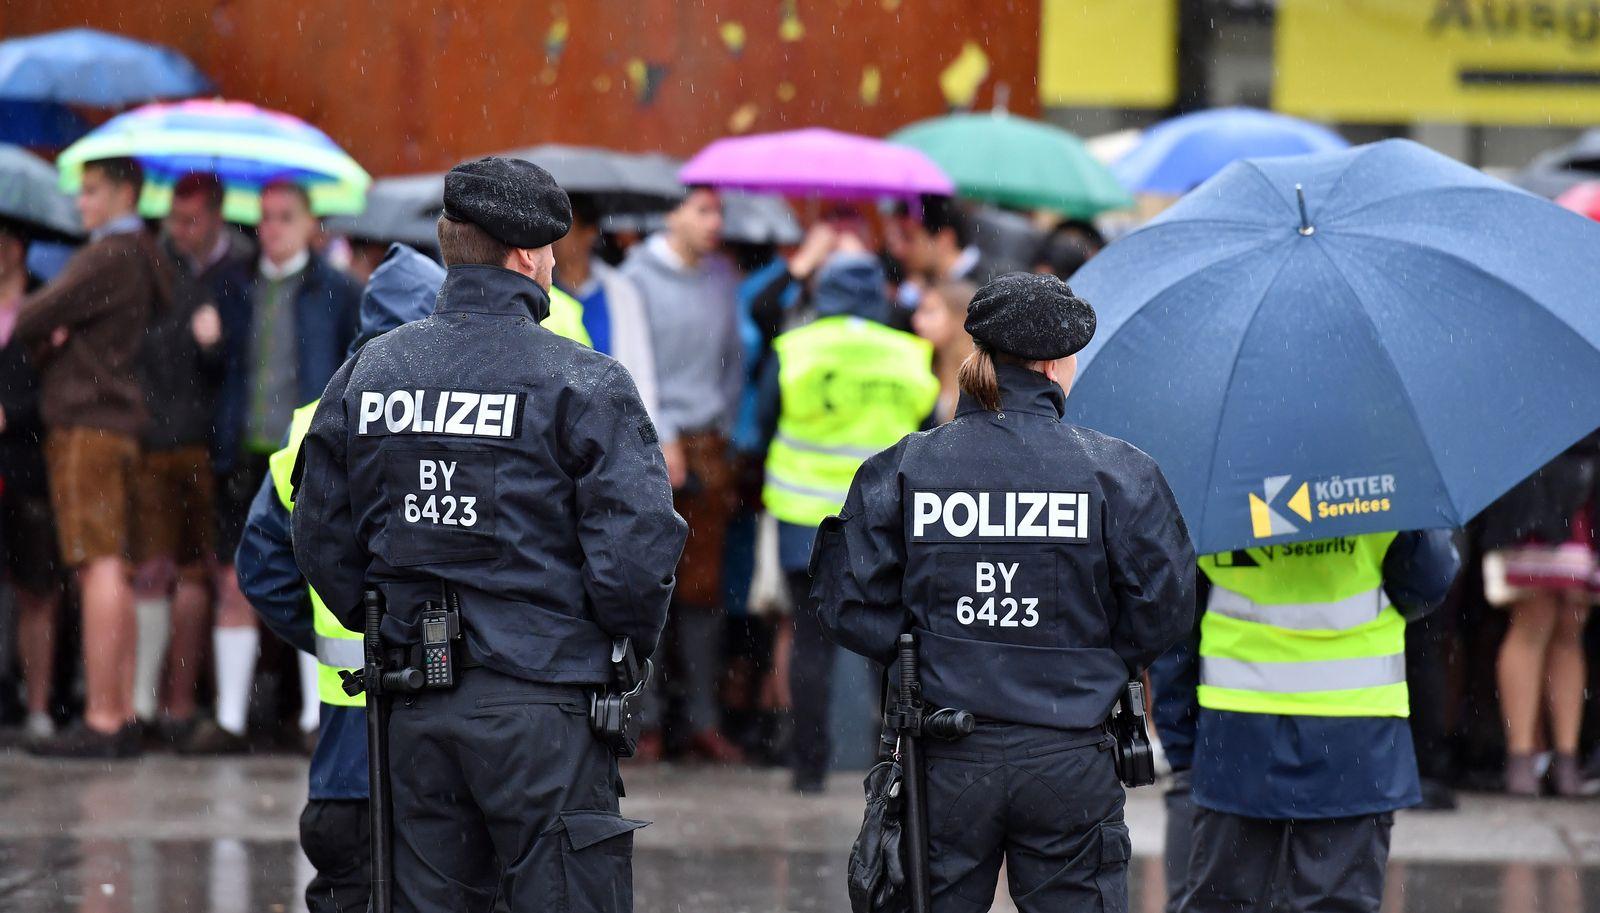 Polizei / Oktoberfest / Größe